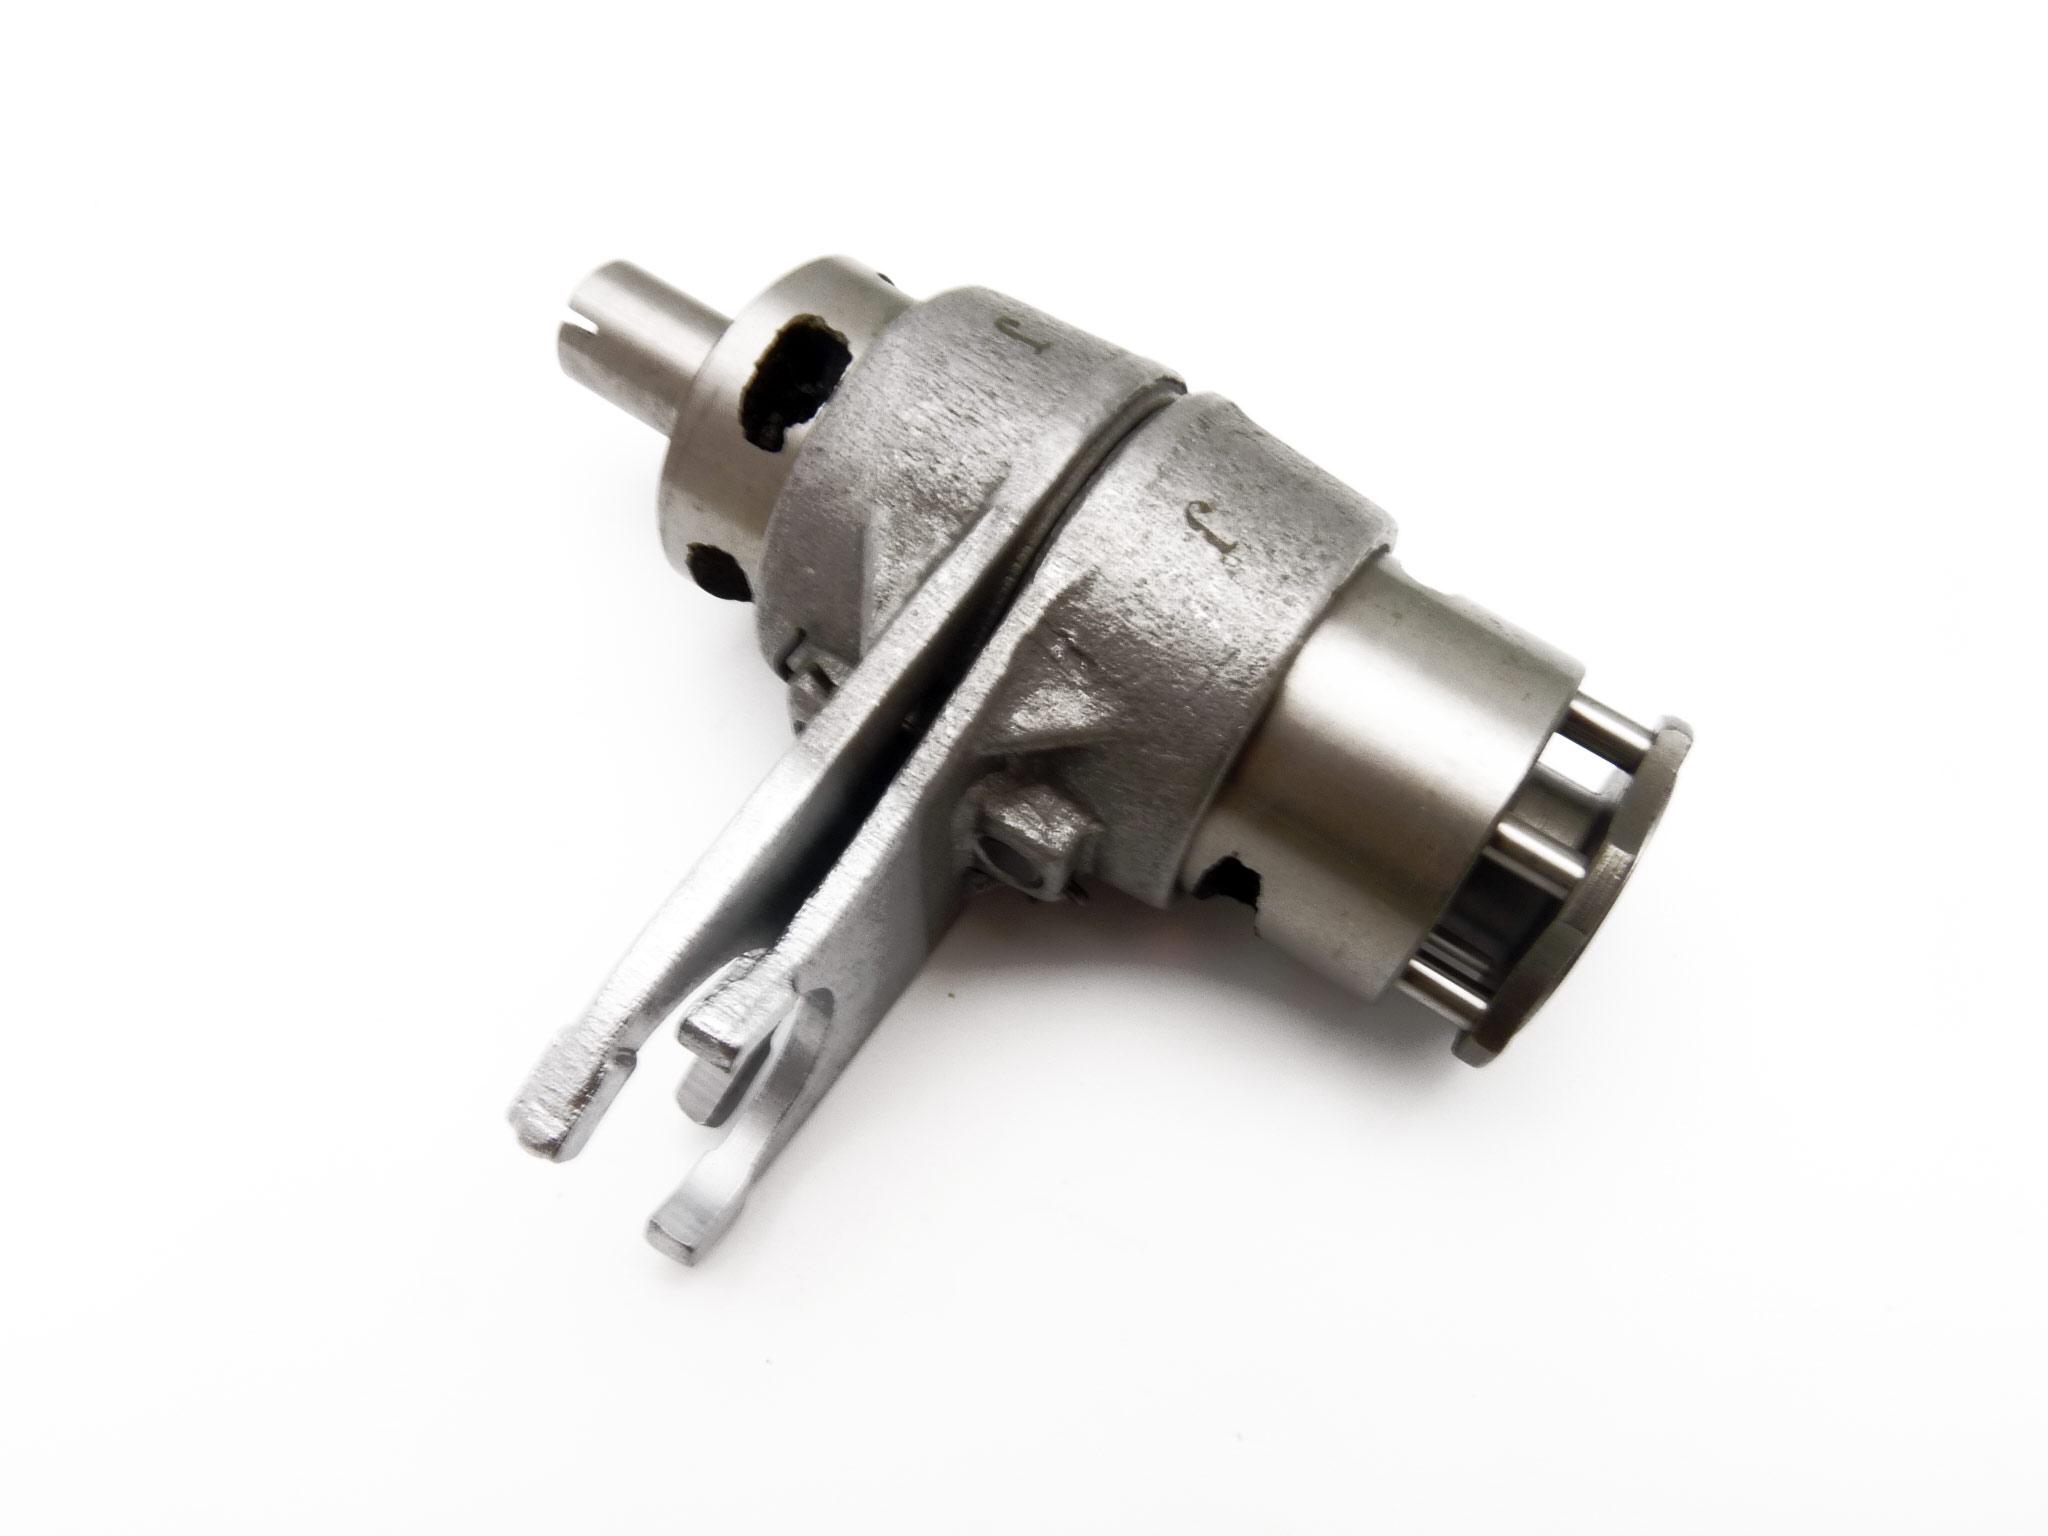 radici segment s vidlickami pro motor yx 160 detroit 170 moto adamek